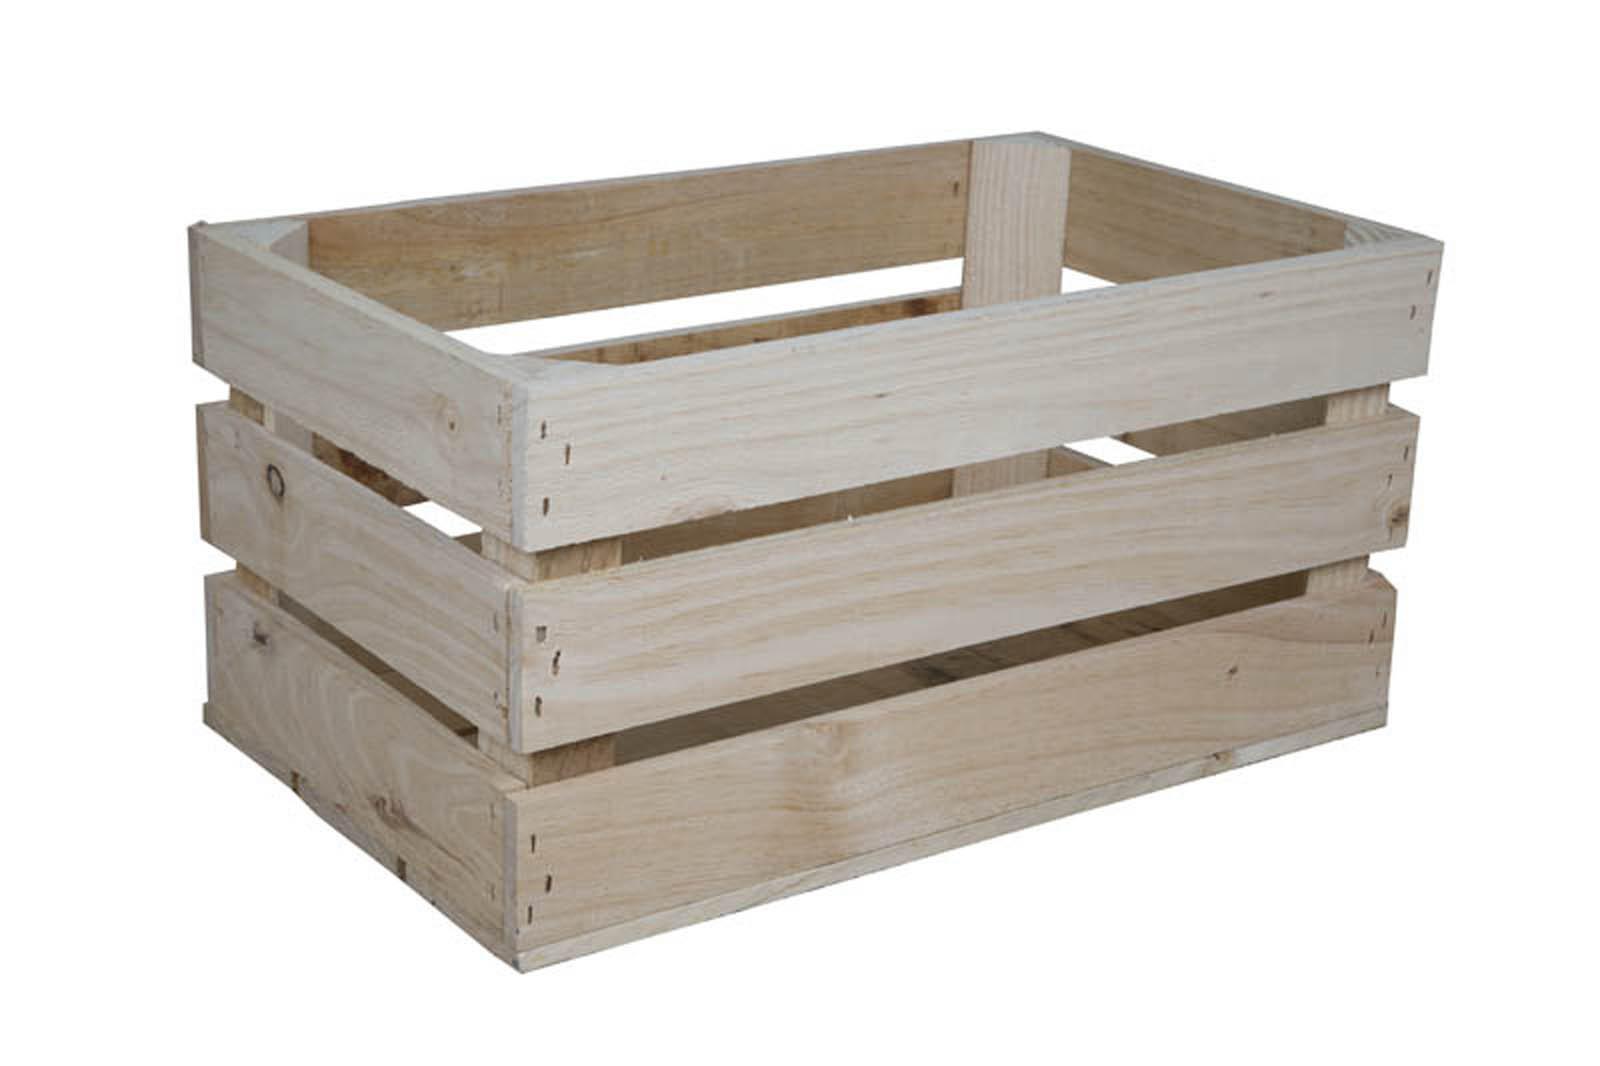 Caja picniquera de madera comprar tipis y casitas de tela - Caja de frutas de madera ...